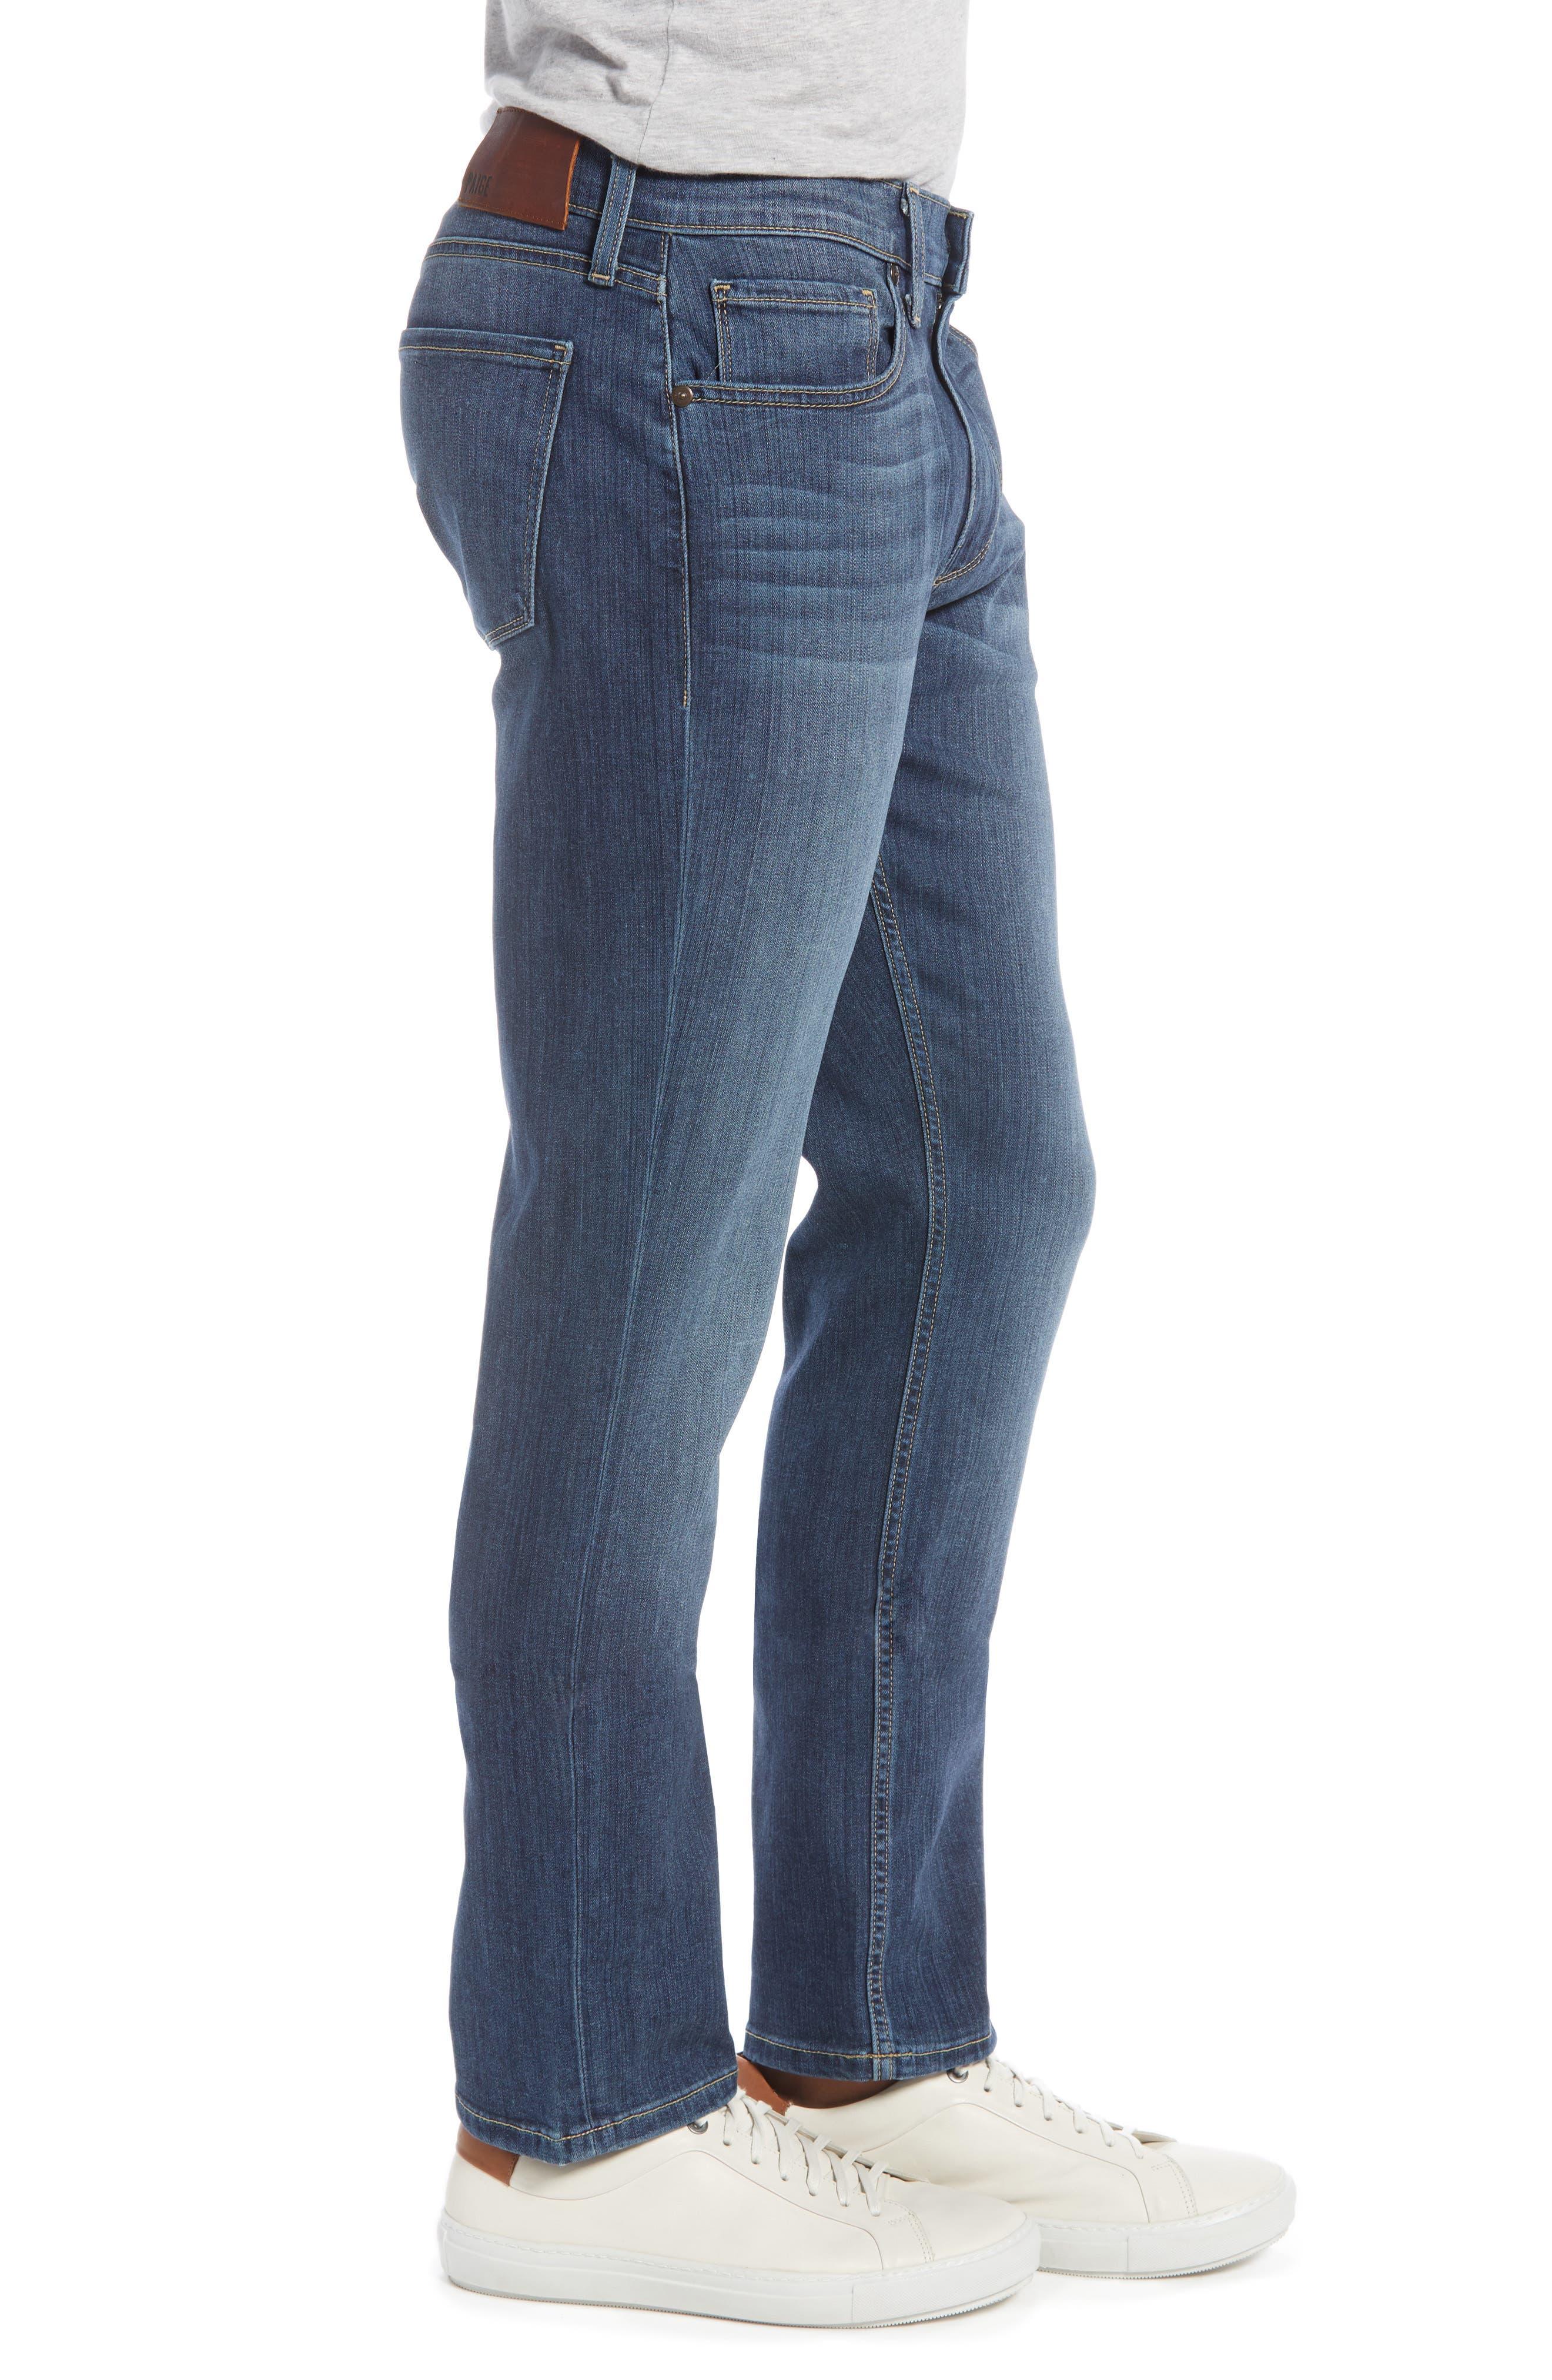 PAIGE, Transcend - Federal Slim Straight Leg Jeans, Alternate thumbnail 5, color, BIRCH